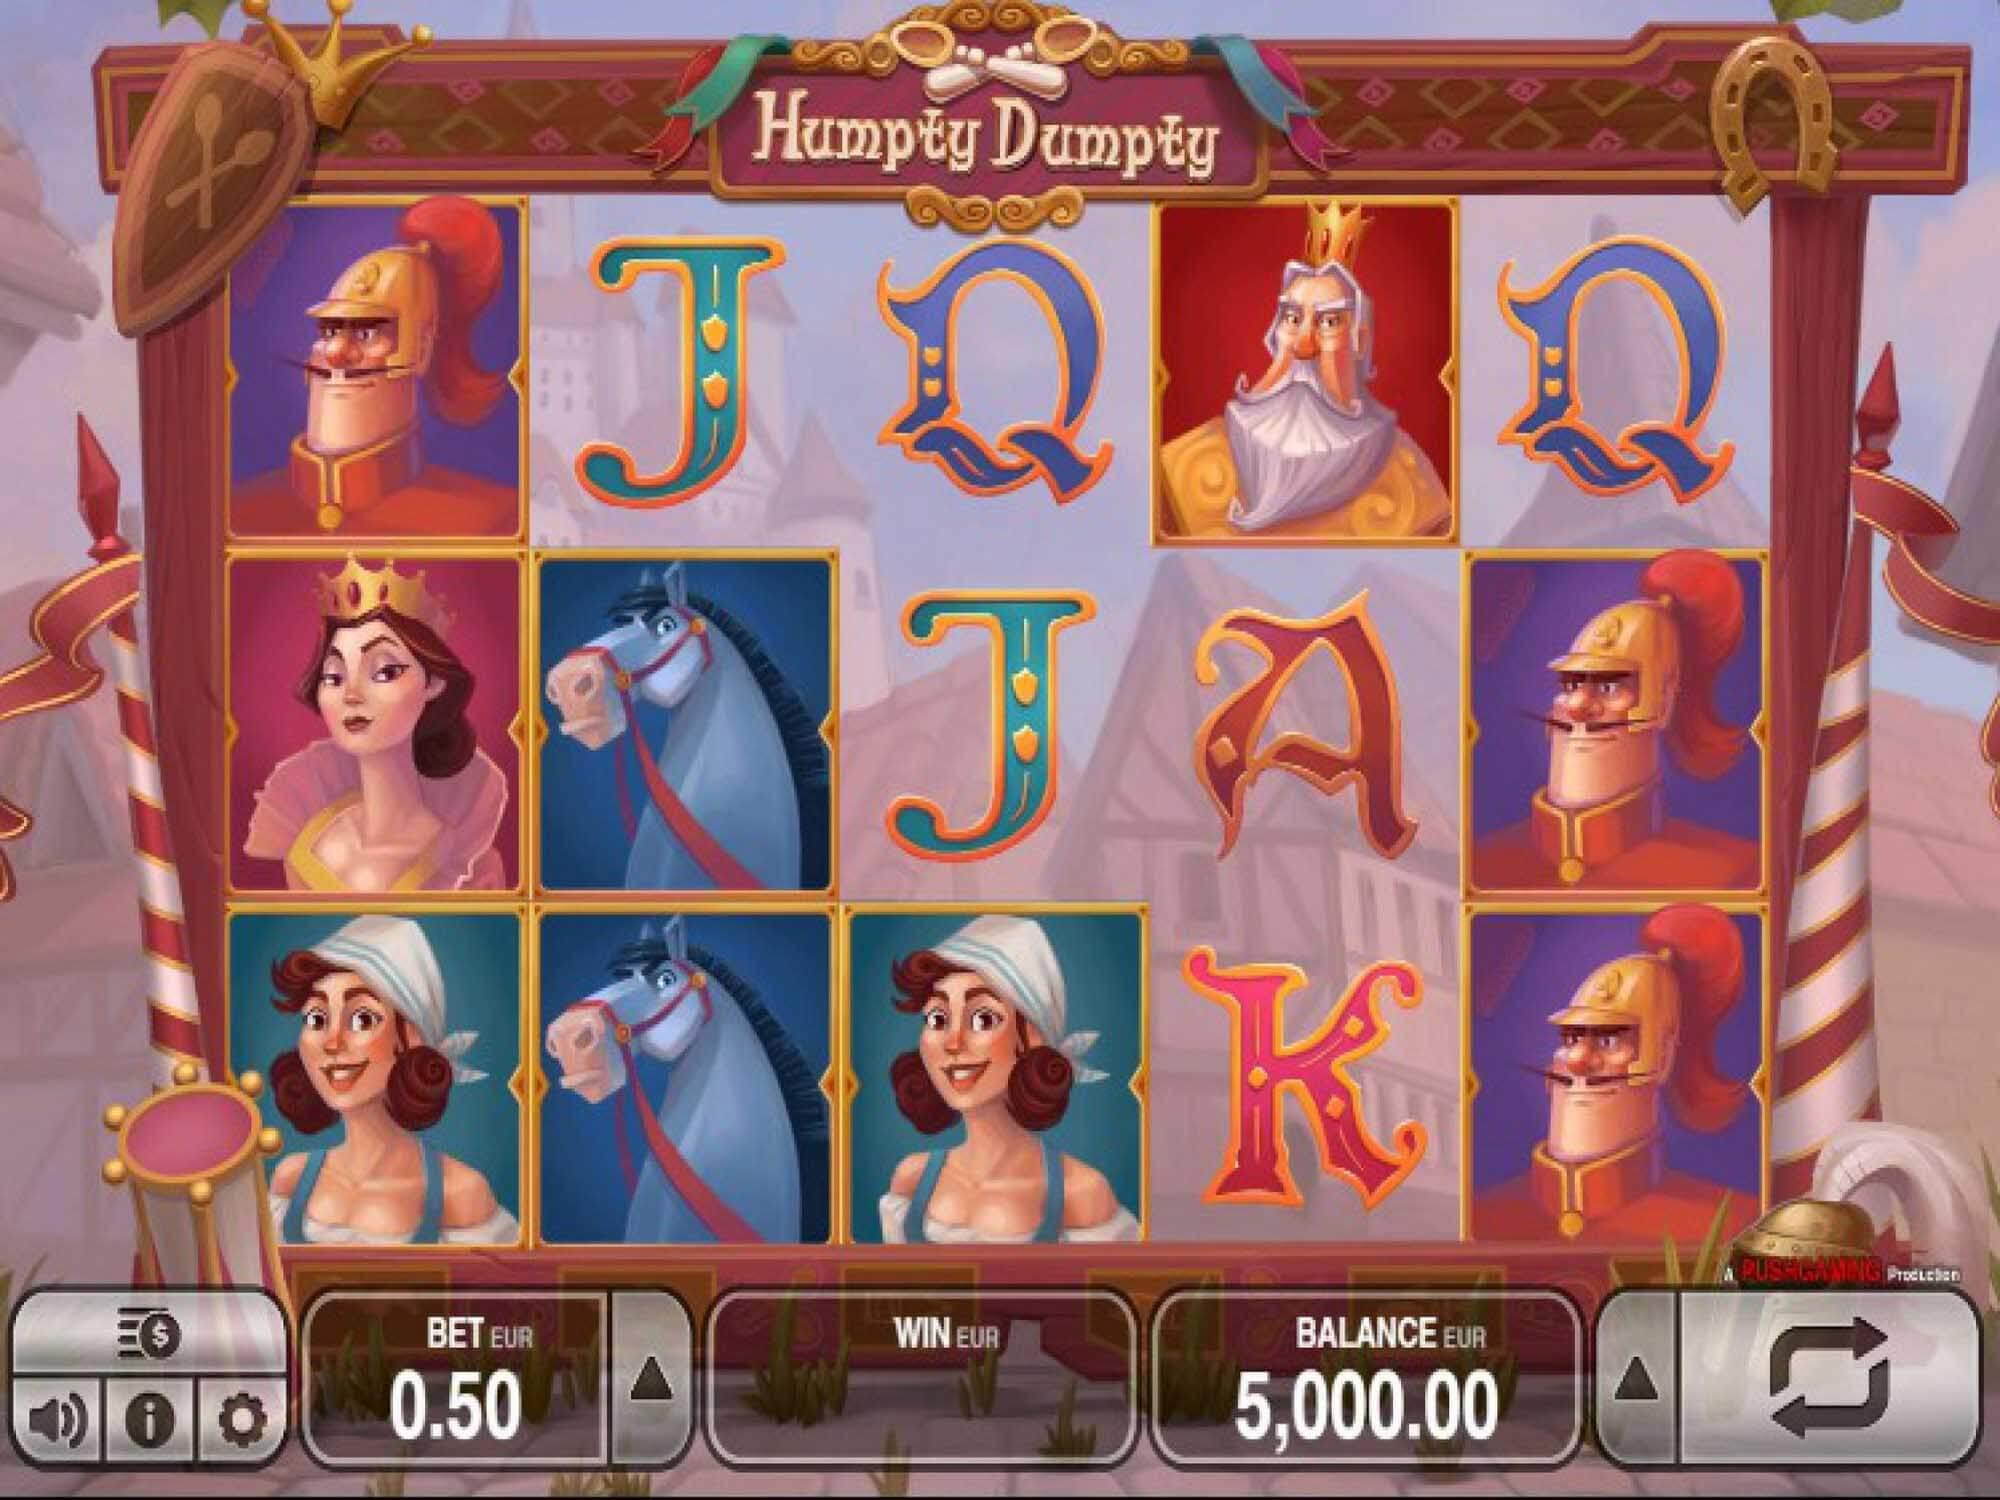 Humpty Dumpty Slot Bonus